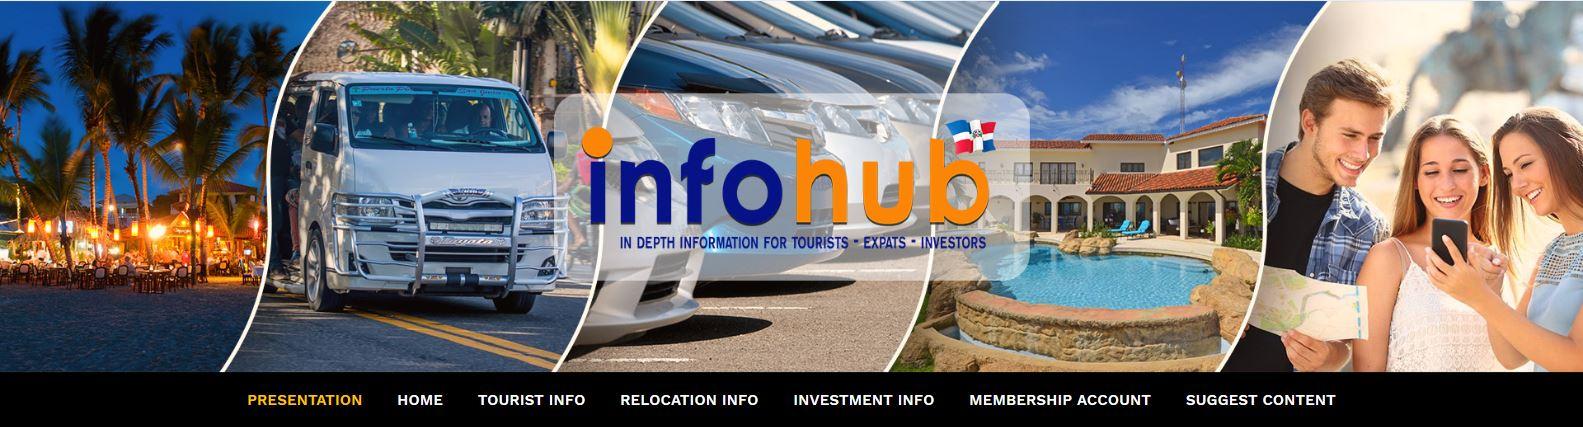 infohub header